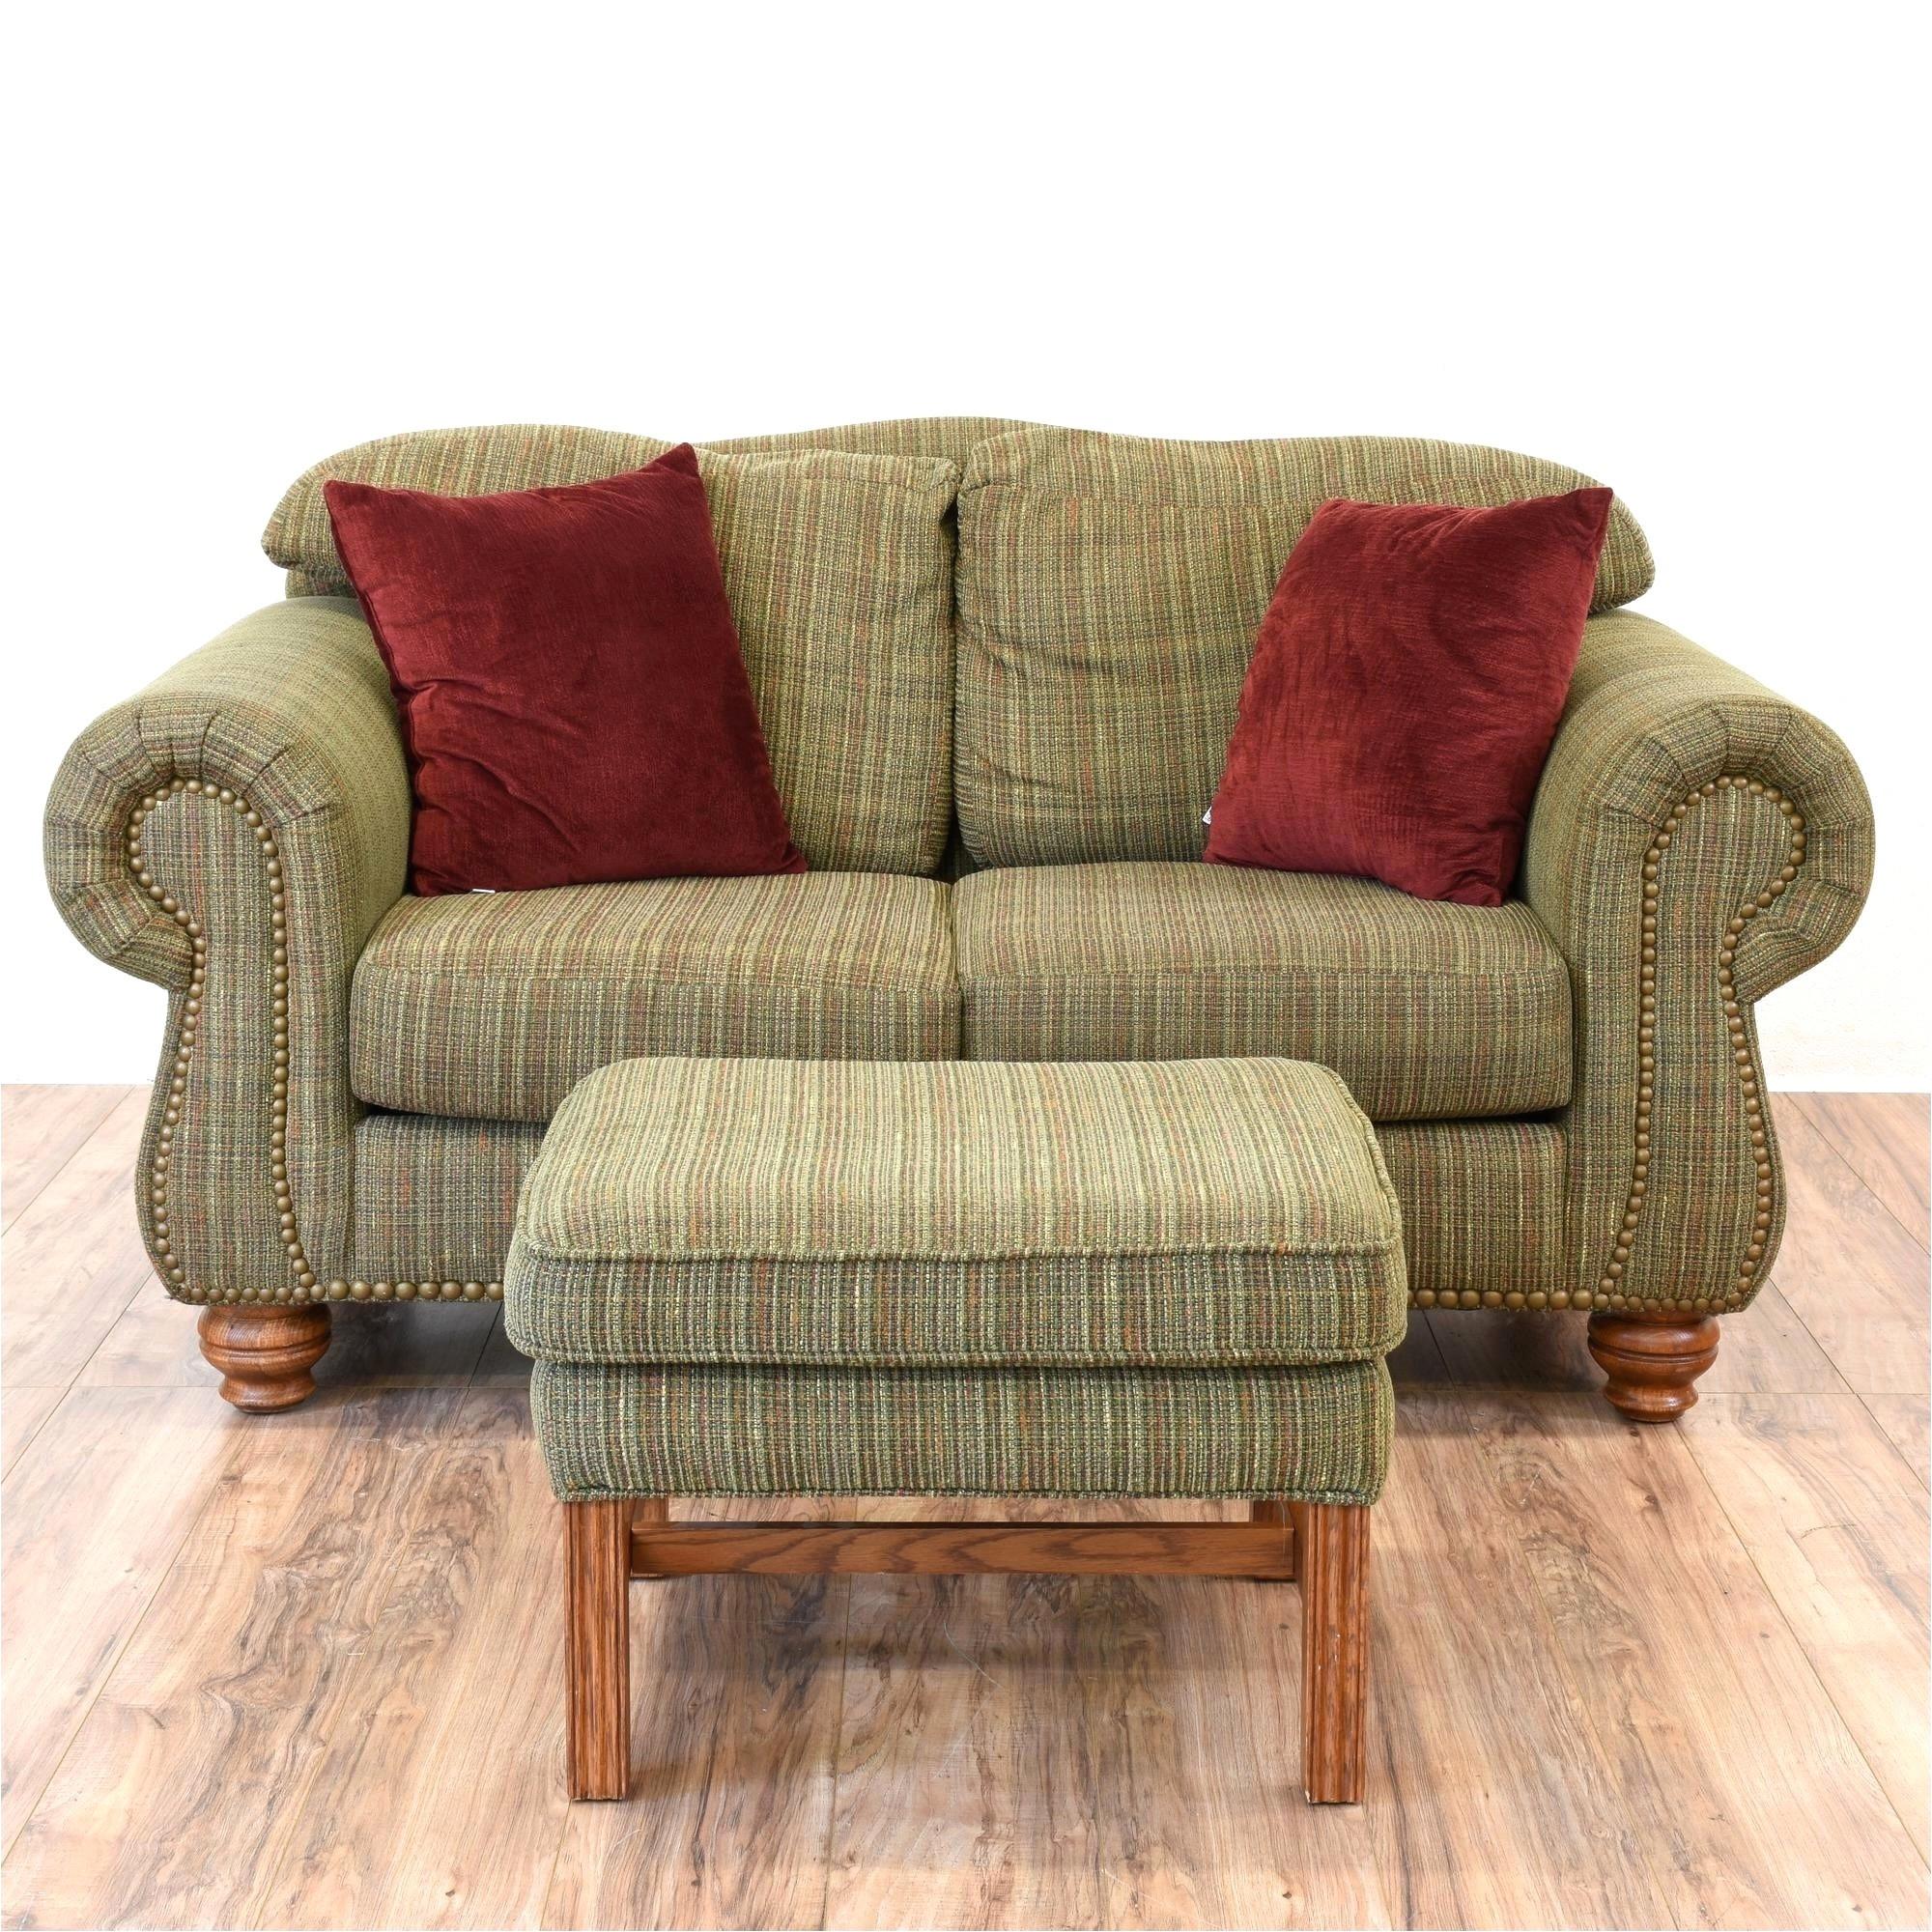 big sofa ikea frisch wonderful sofa tables ikea designsolutions usa sammlung